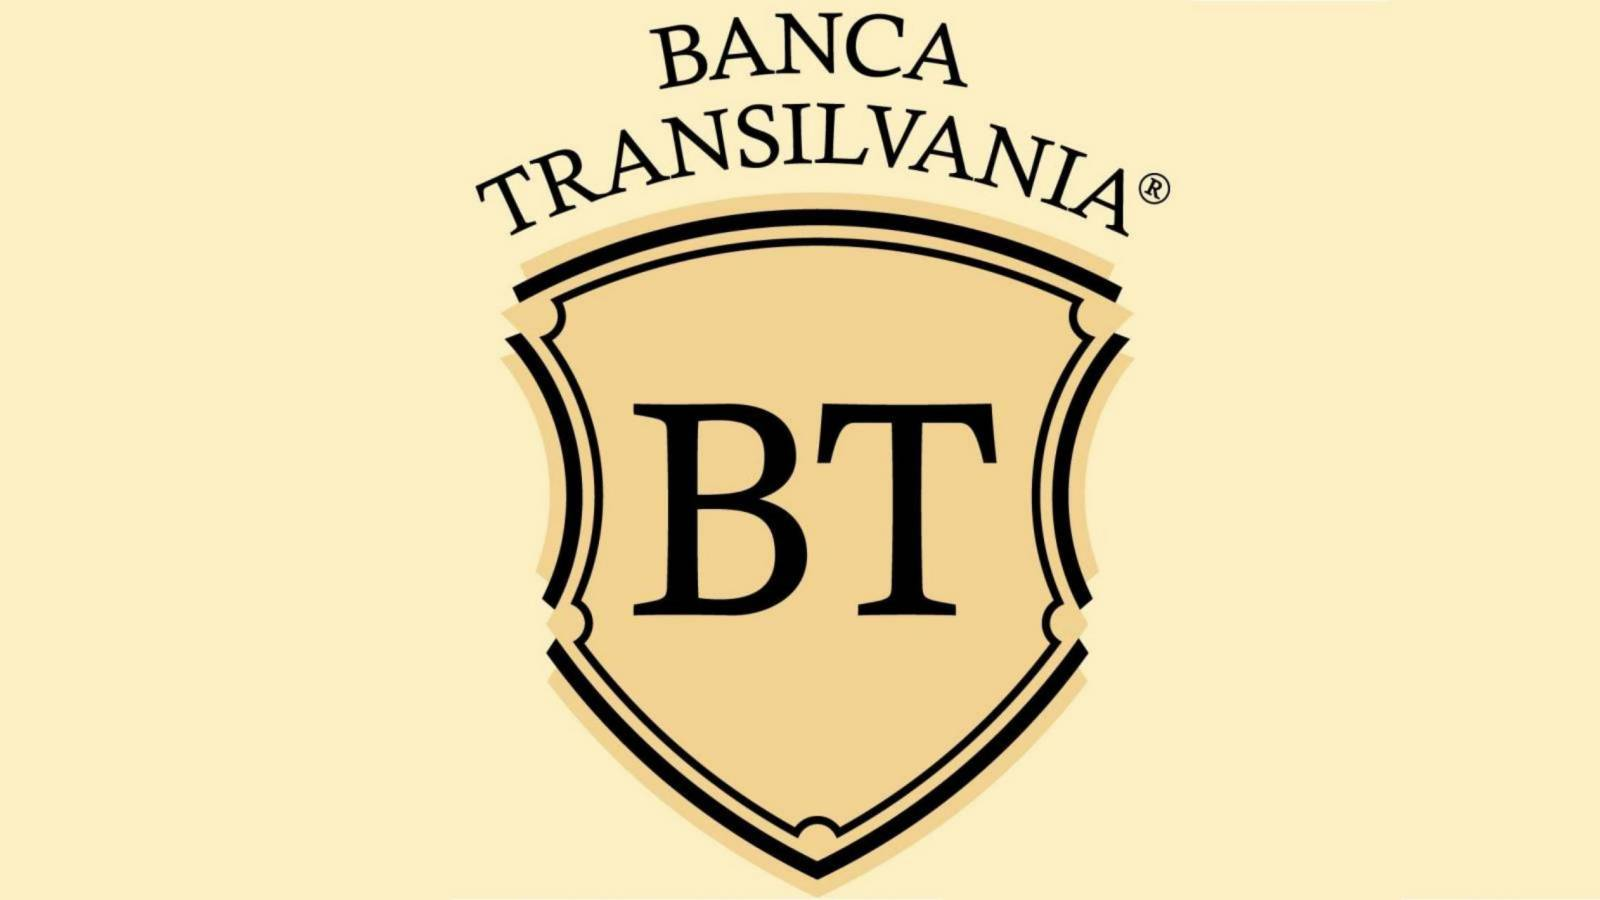 Banca Transilvania simplificare